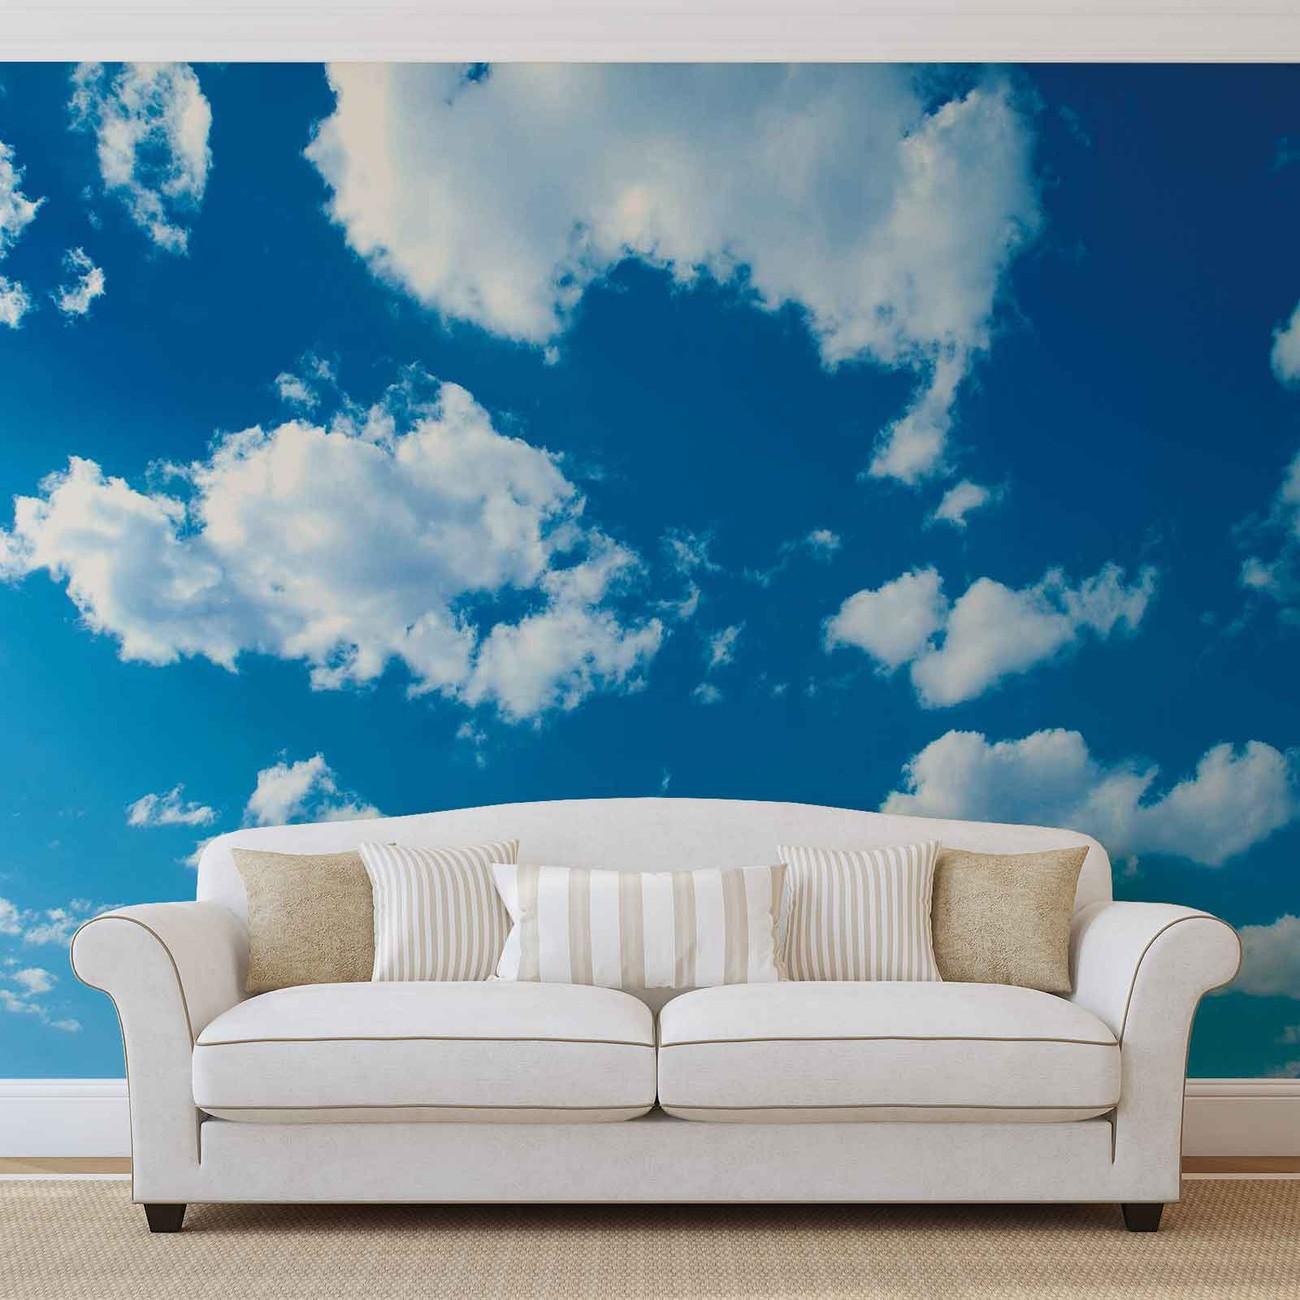 fototapete tapete wolken himmel natur bei europosters. Black Bedroom Furniture Sets. Home Design Ideas